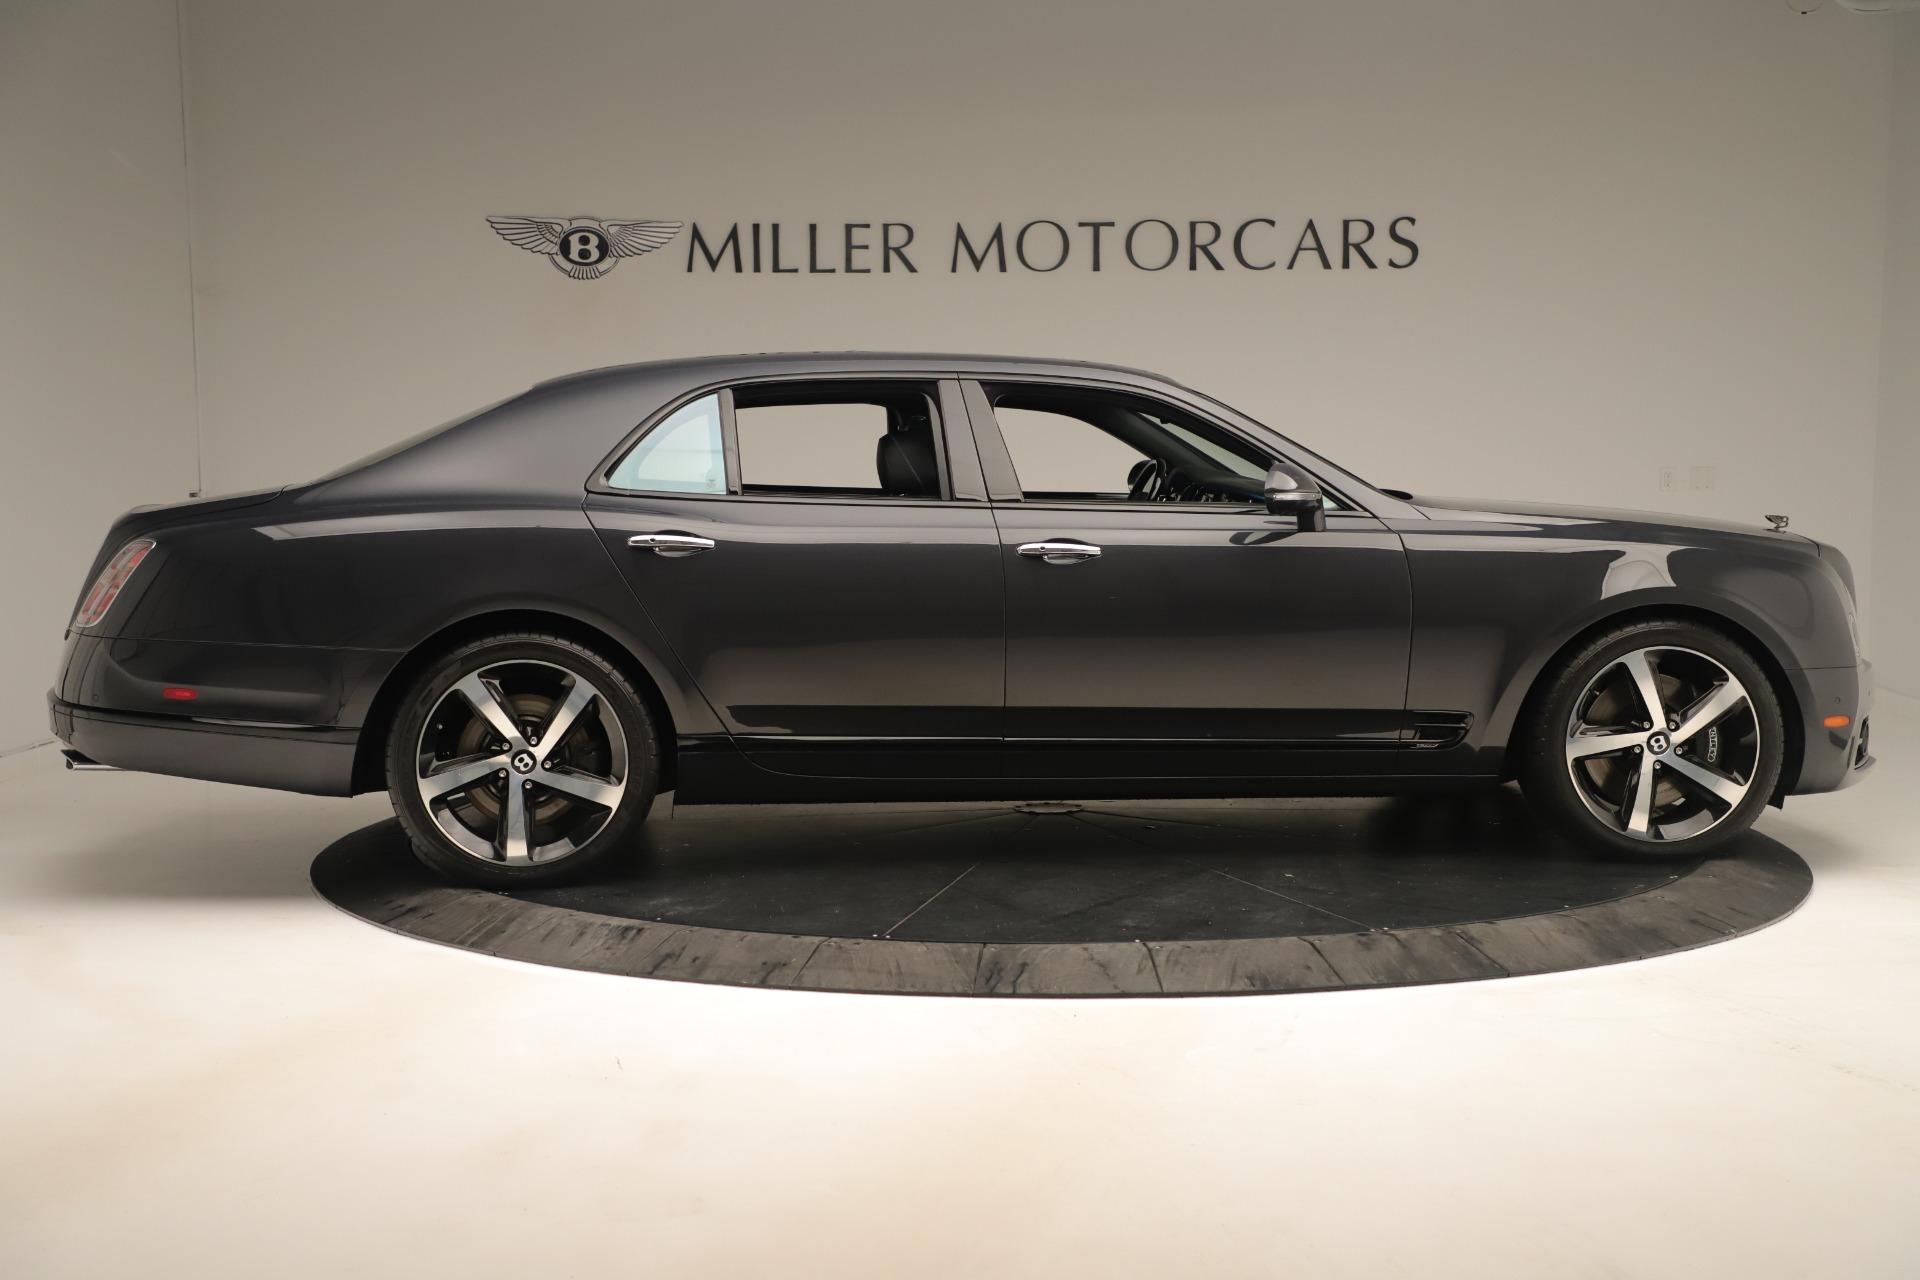 Used 2018 Bentley Mulsanne Speed Design Series For Sale In Westport, CT 3405_p9